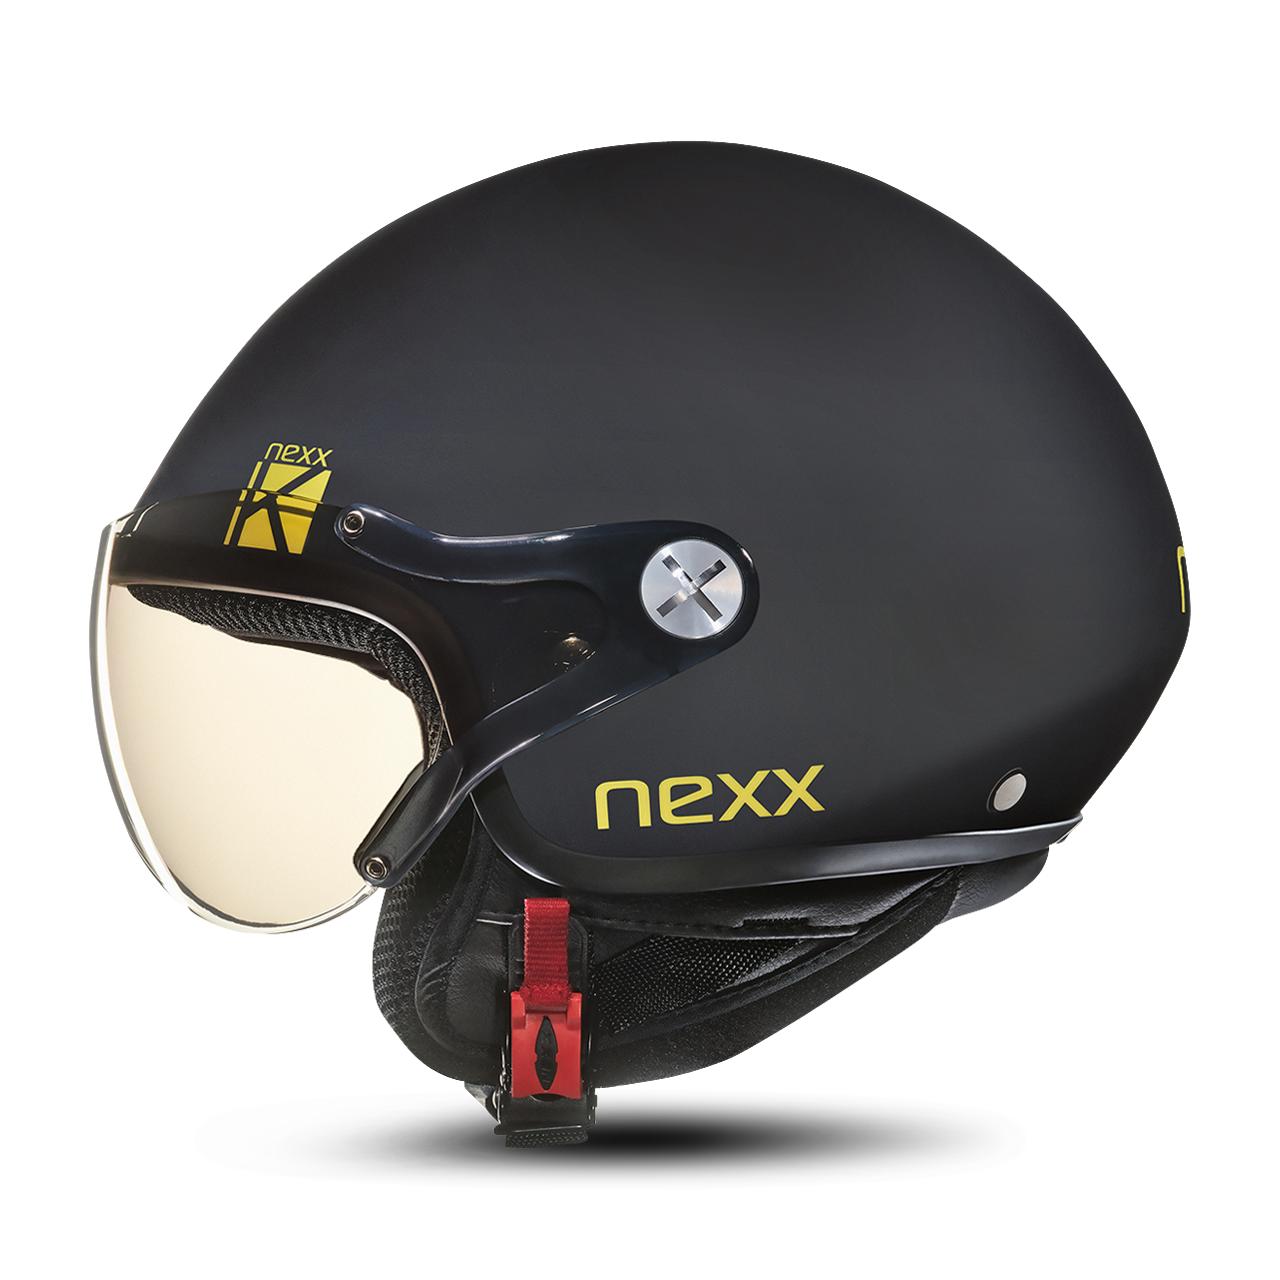 nexx casco jet bambino  sx.60 kids k nero